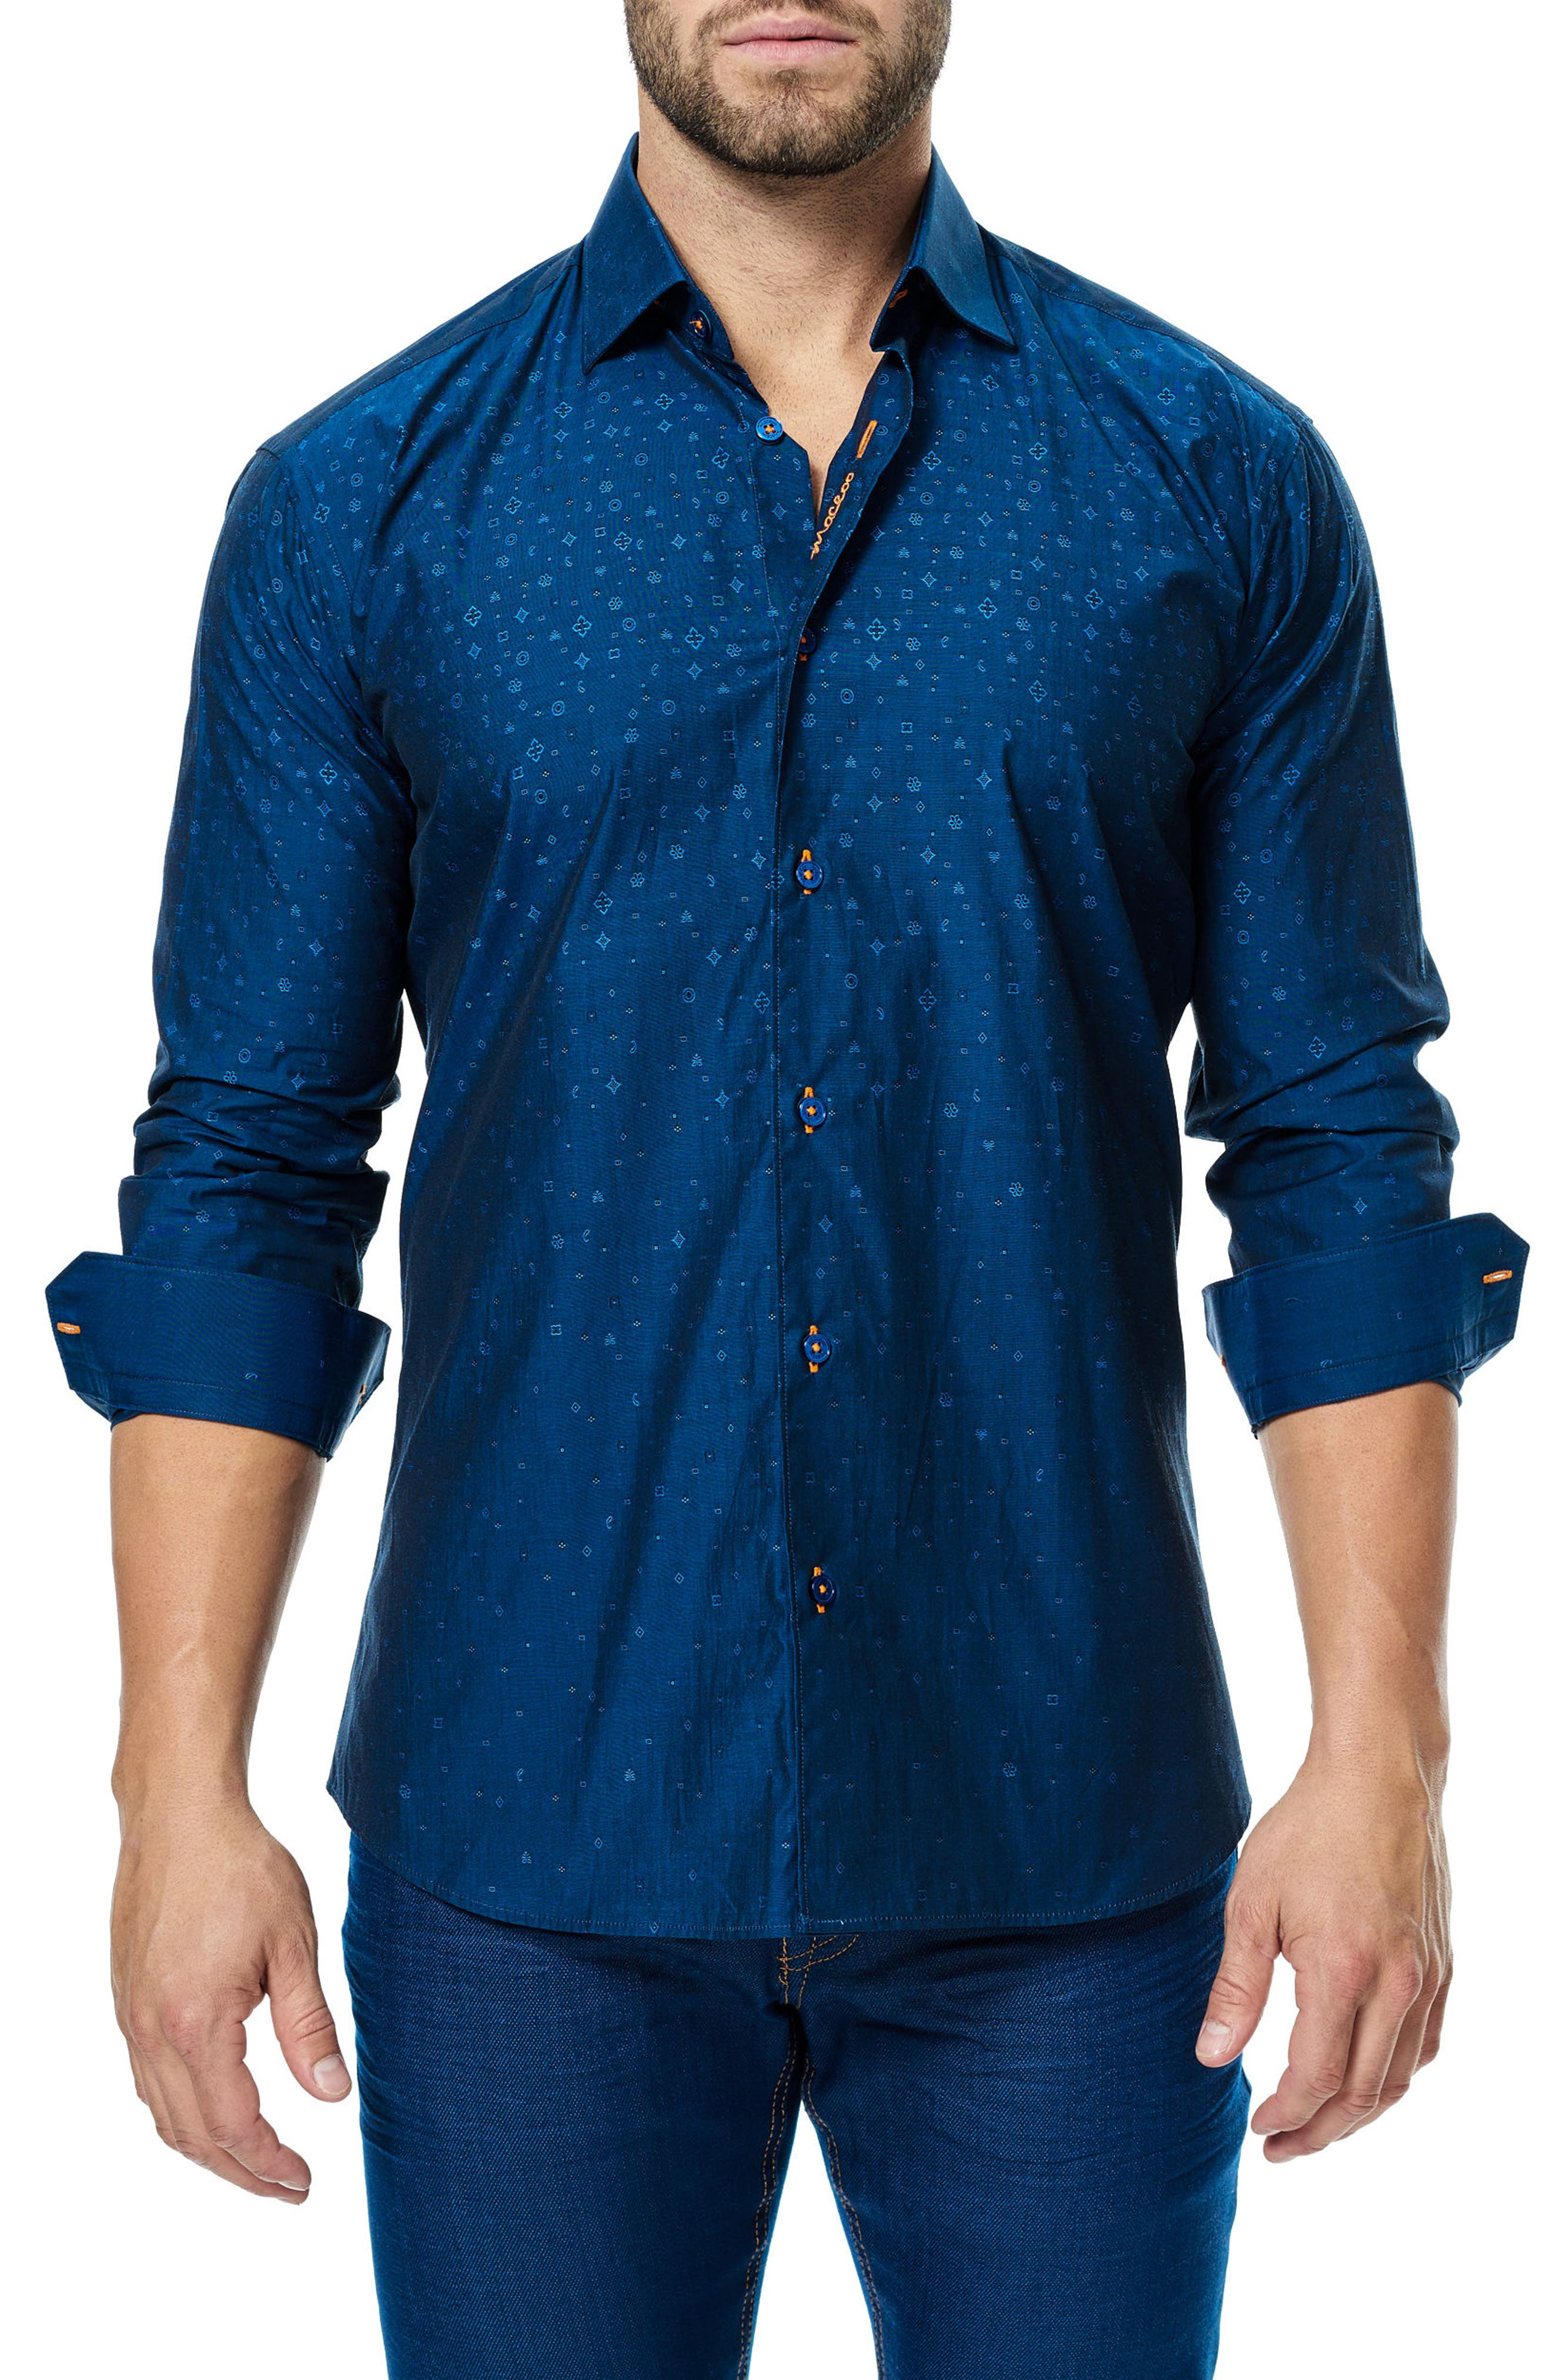 Luxor Icons Sport Shirt,                         Main,                         color, Navy Blue